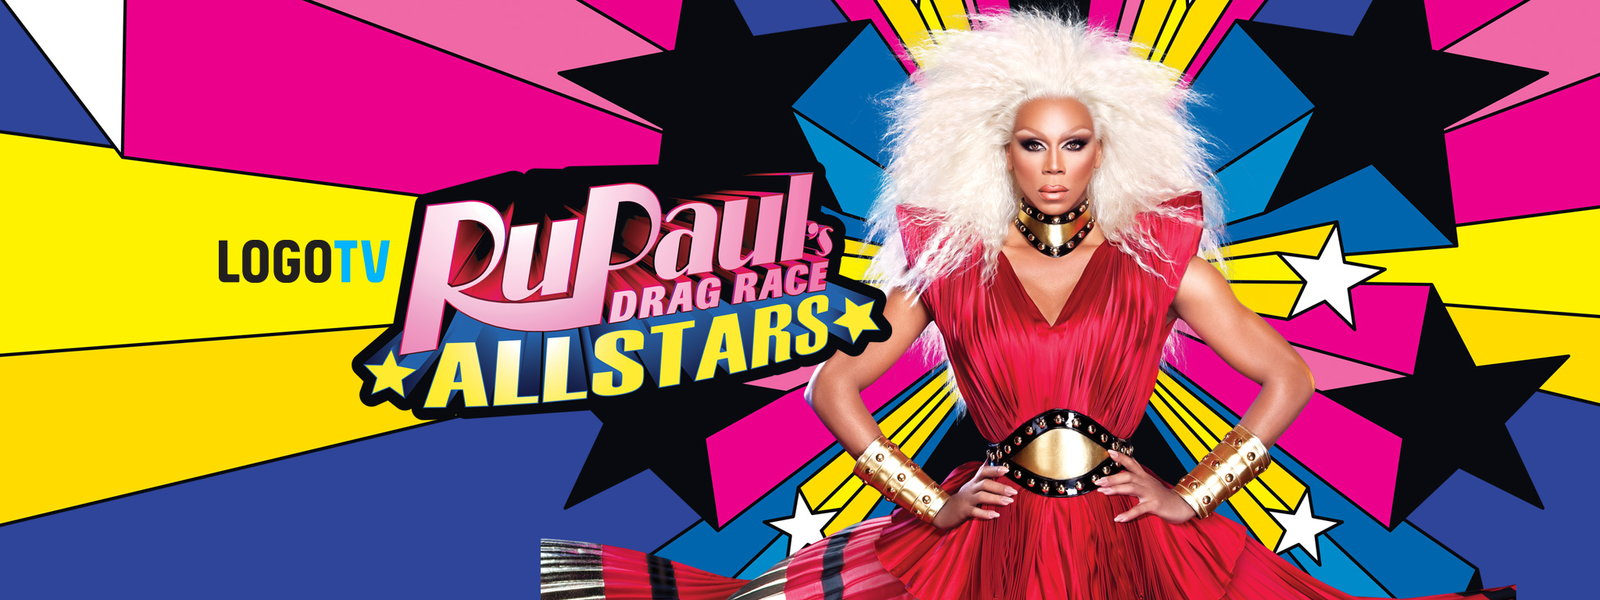 Watch Rupaul S All Stars Drag Race Season 3 Episode 2 Online Full Series Crowdcast